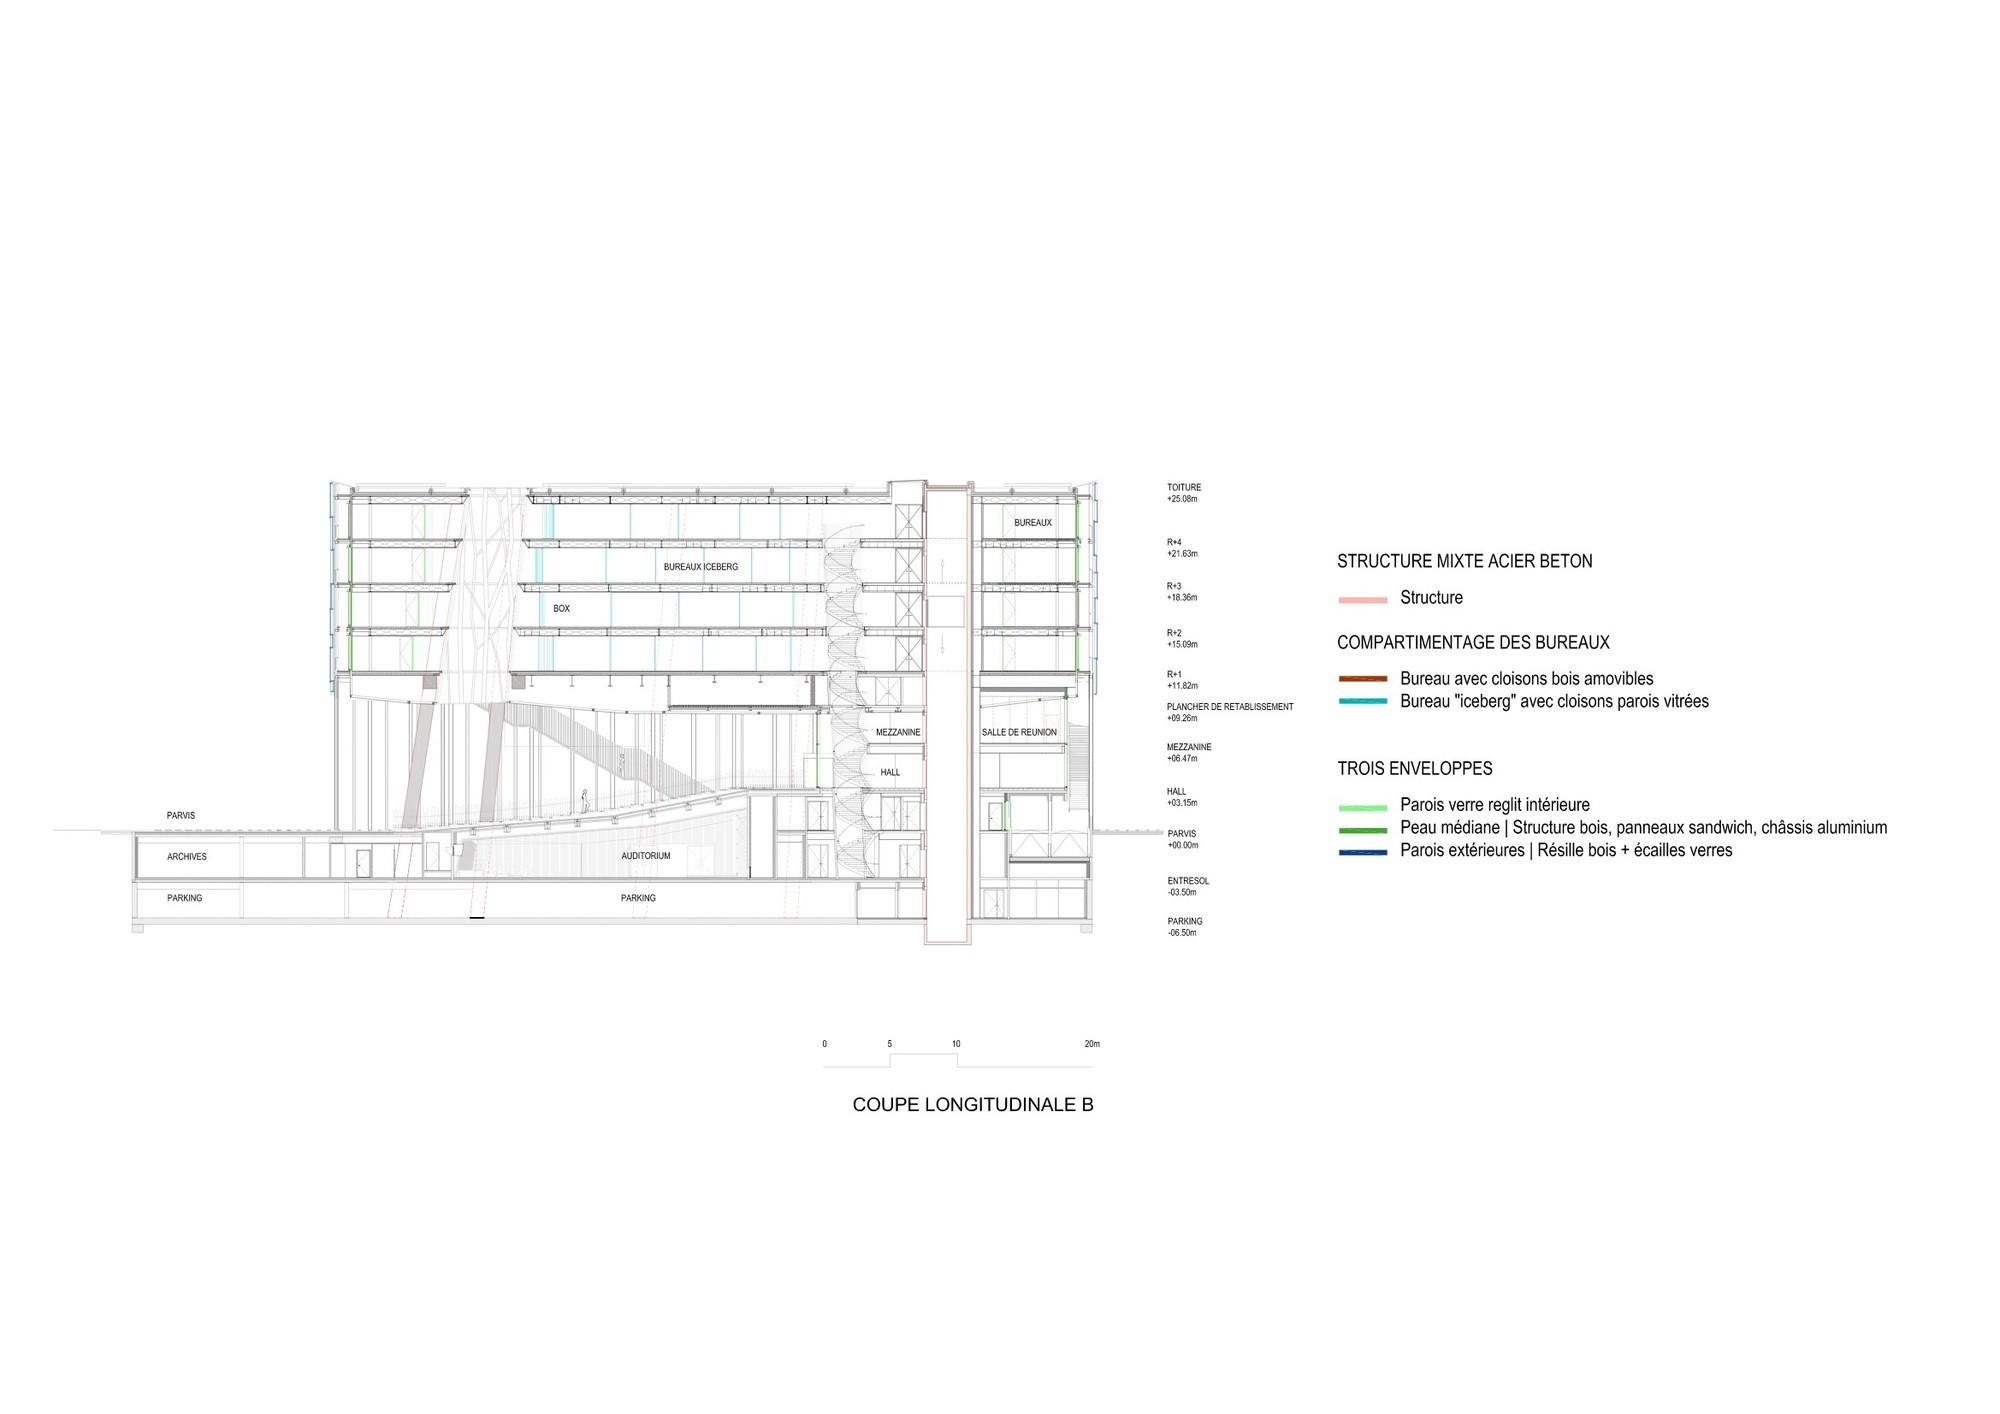 galer a de casa comunitaria de lorient jean de giacinto architecture duncan lewis scape. Black Bedroom Furniture Sets. Home Design Ideas